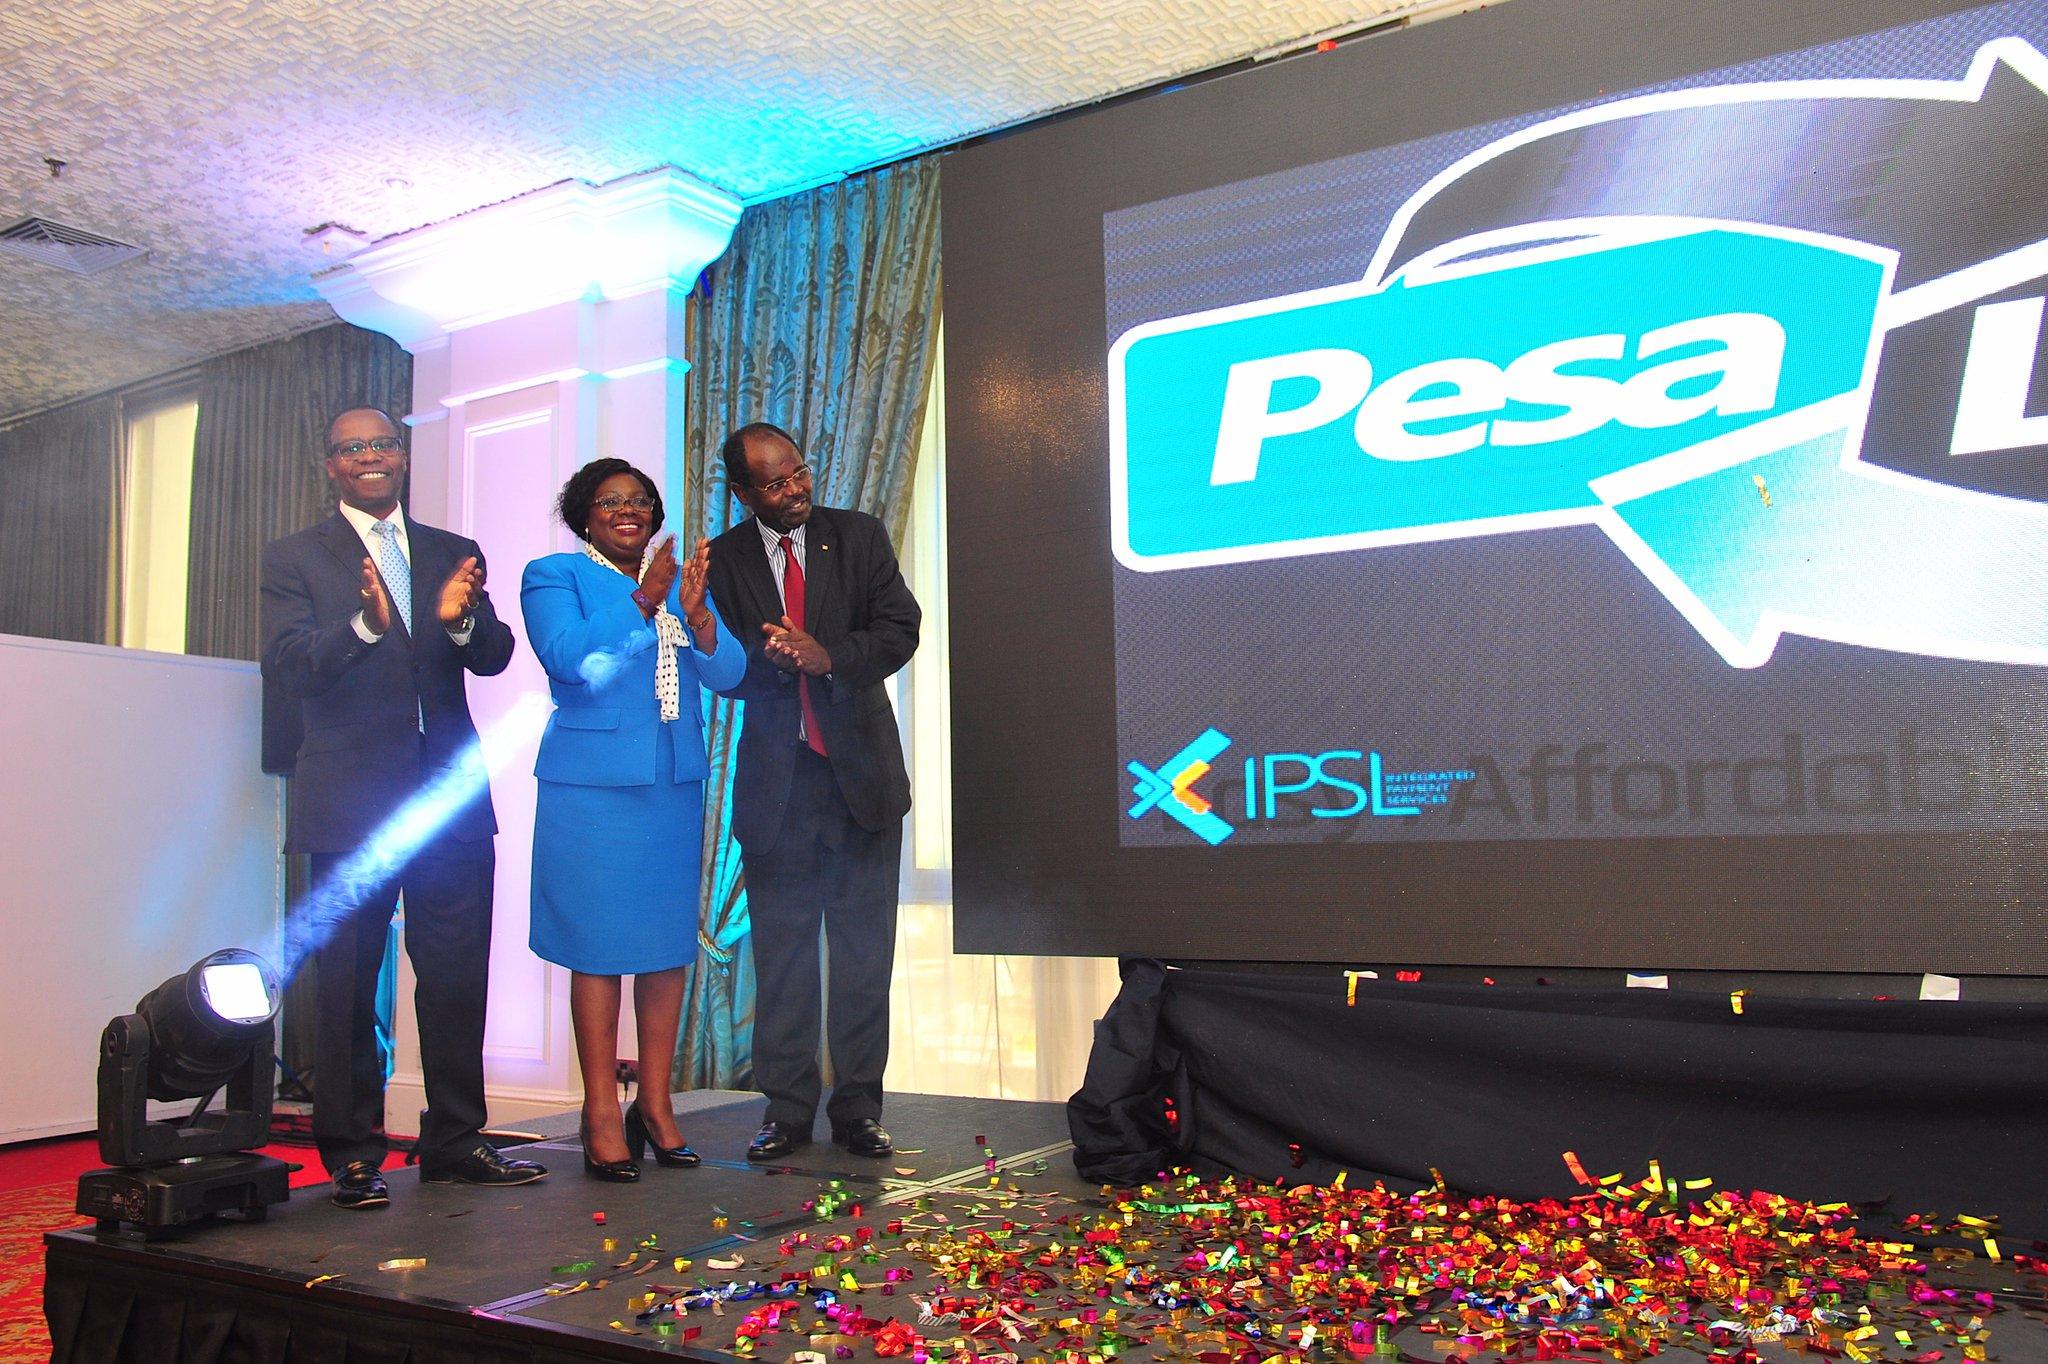 PesaLink unveiled